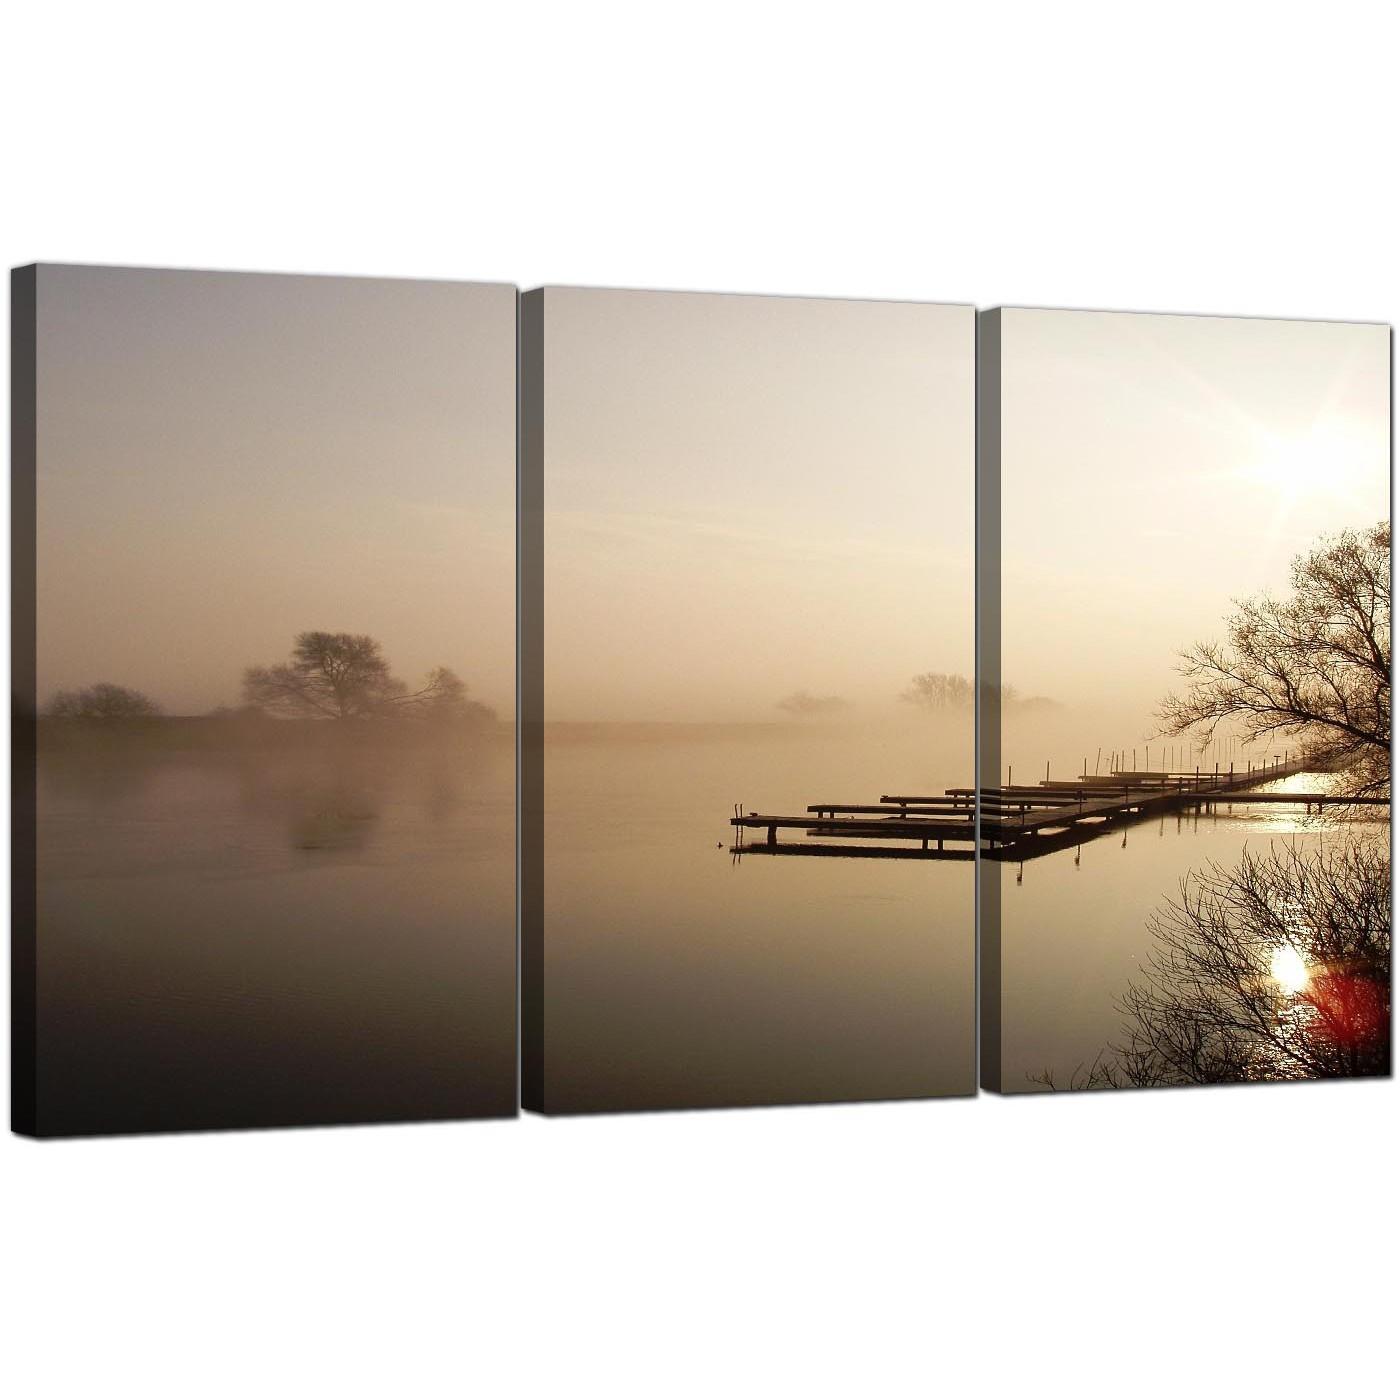 Display Gallery Item 5; Set Of 3 Landscape Canvas Prints UK Countryside  3117 Display Gallery Item 6